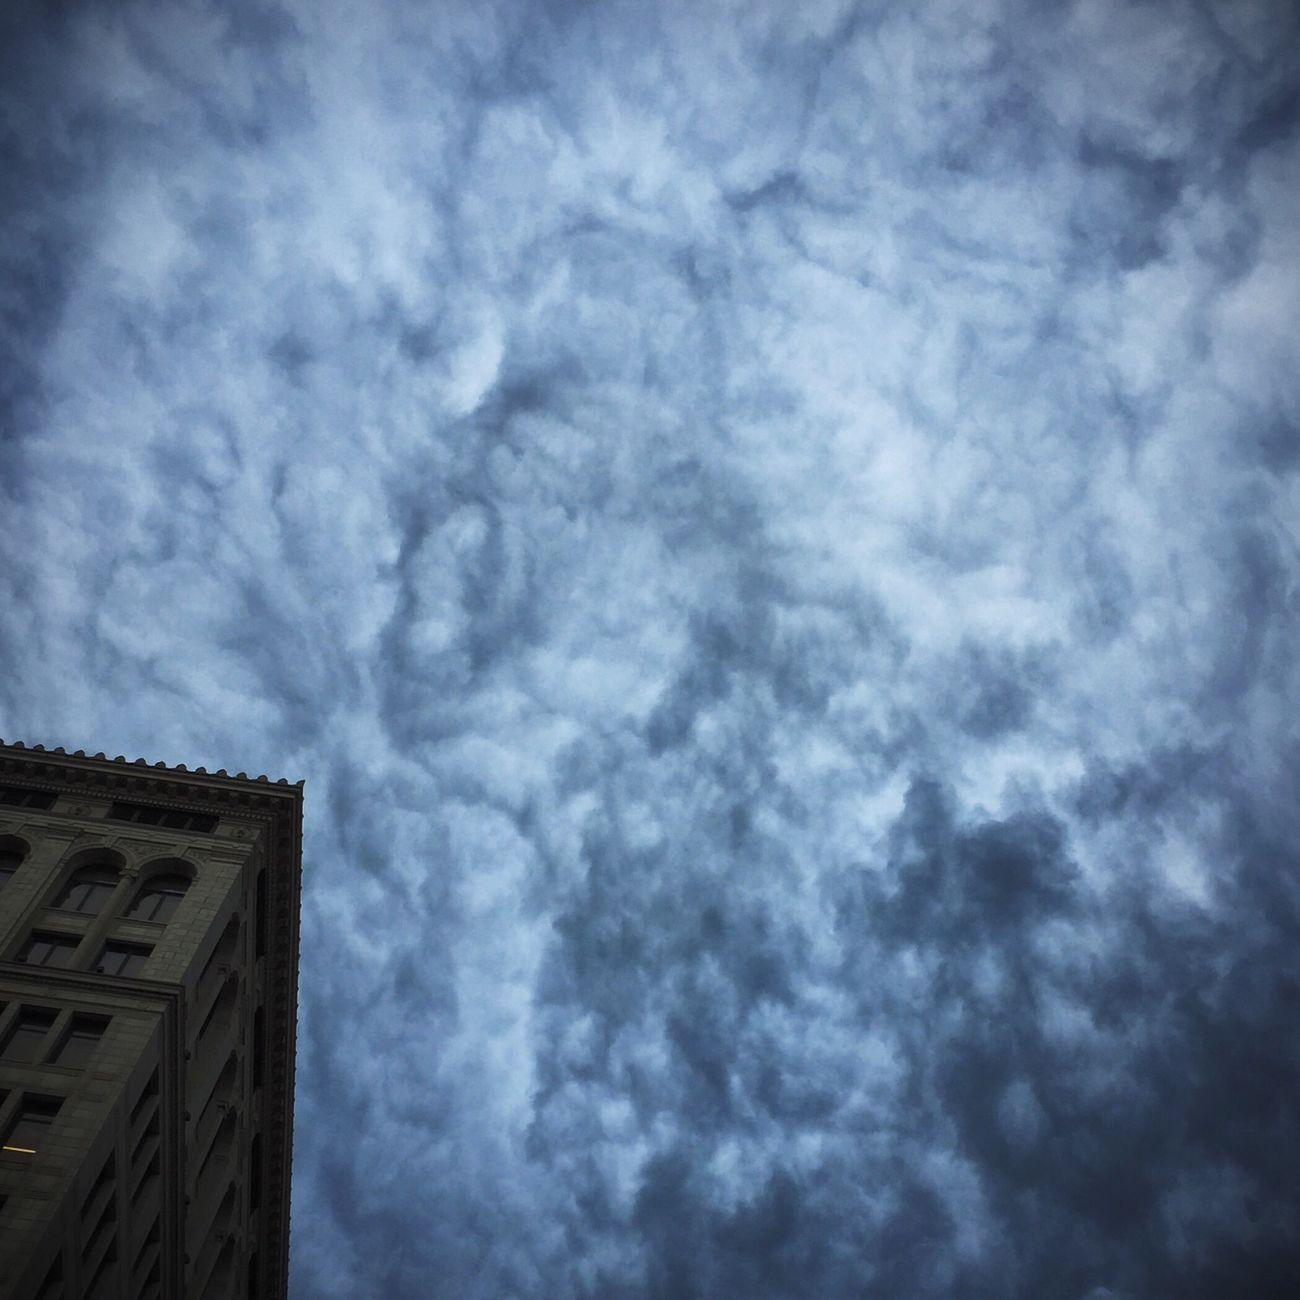 Menacing Clouds over New York City